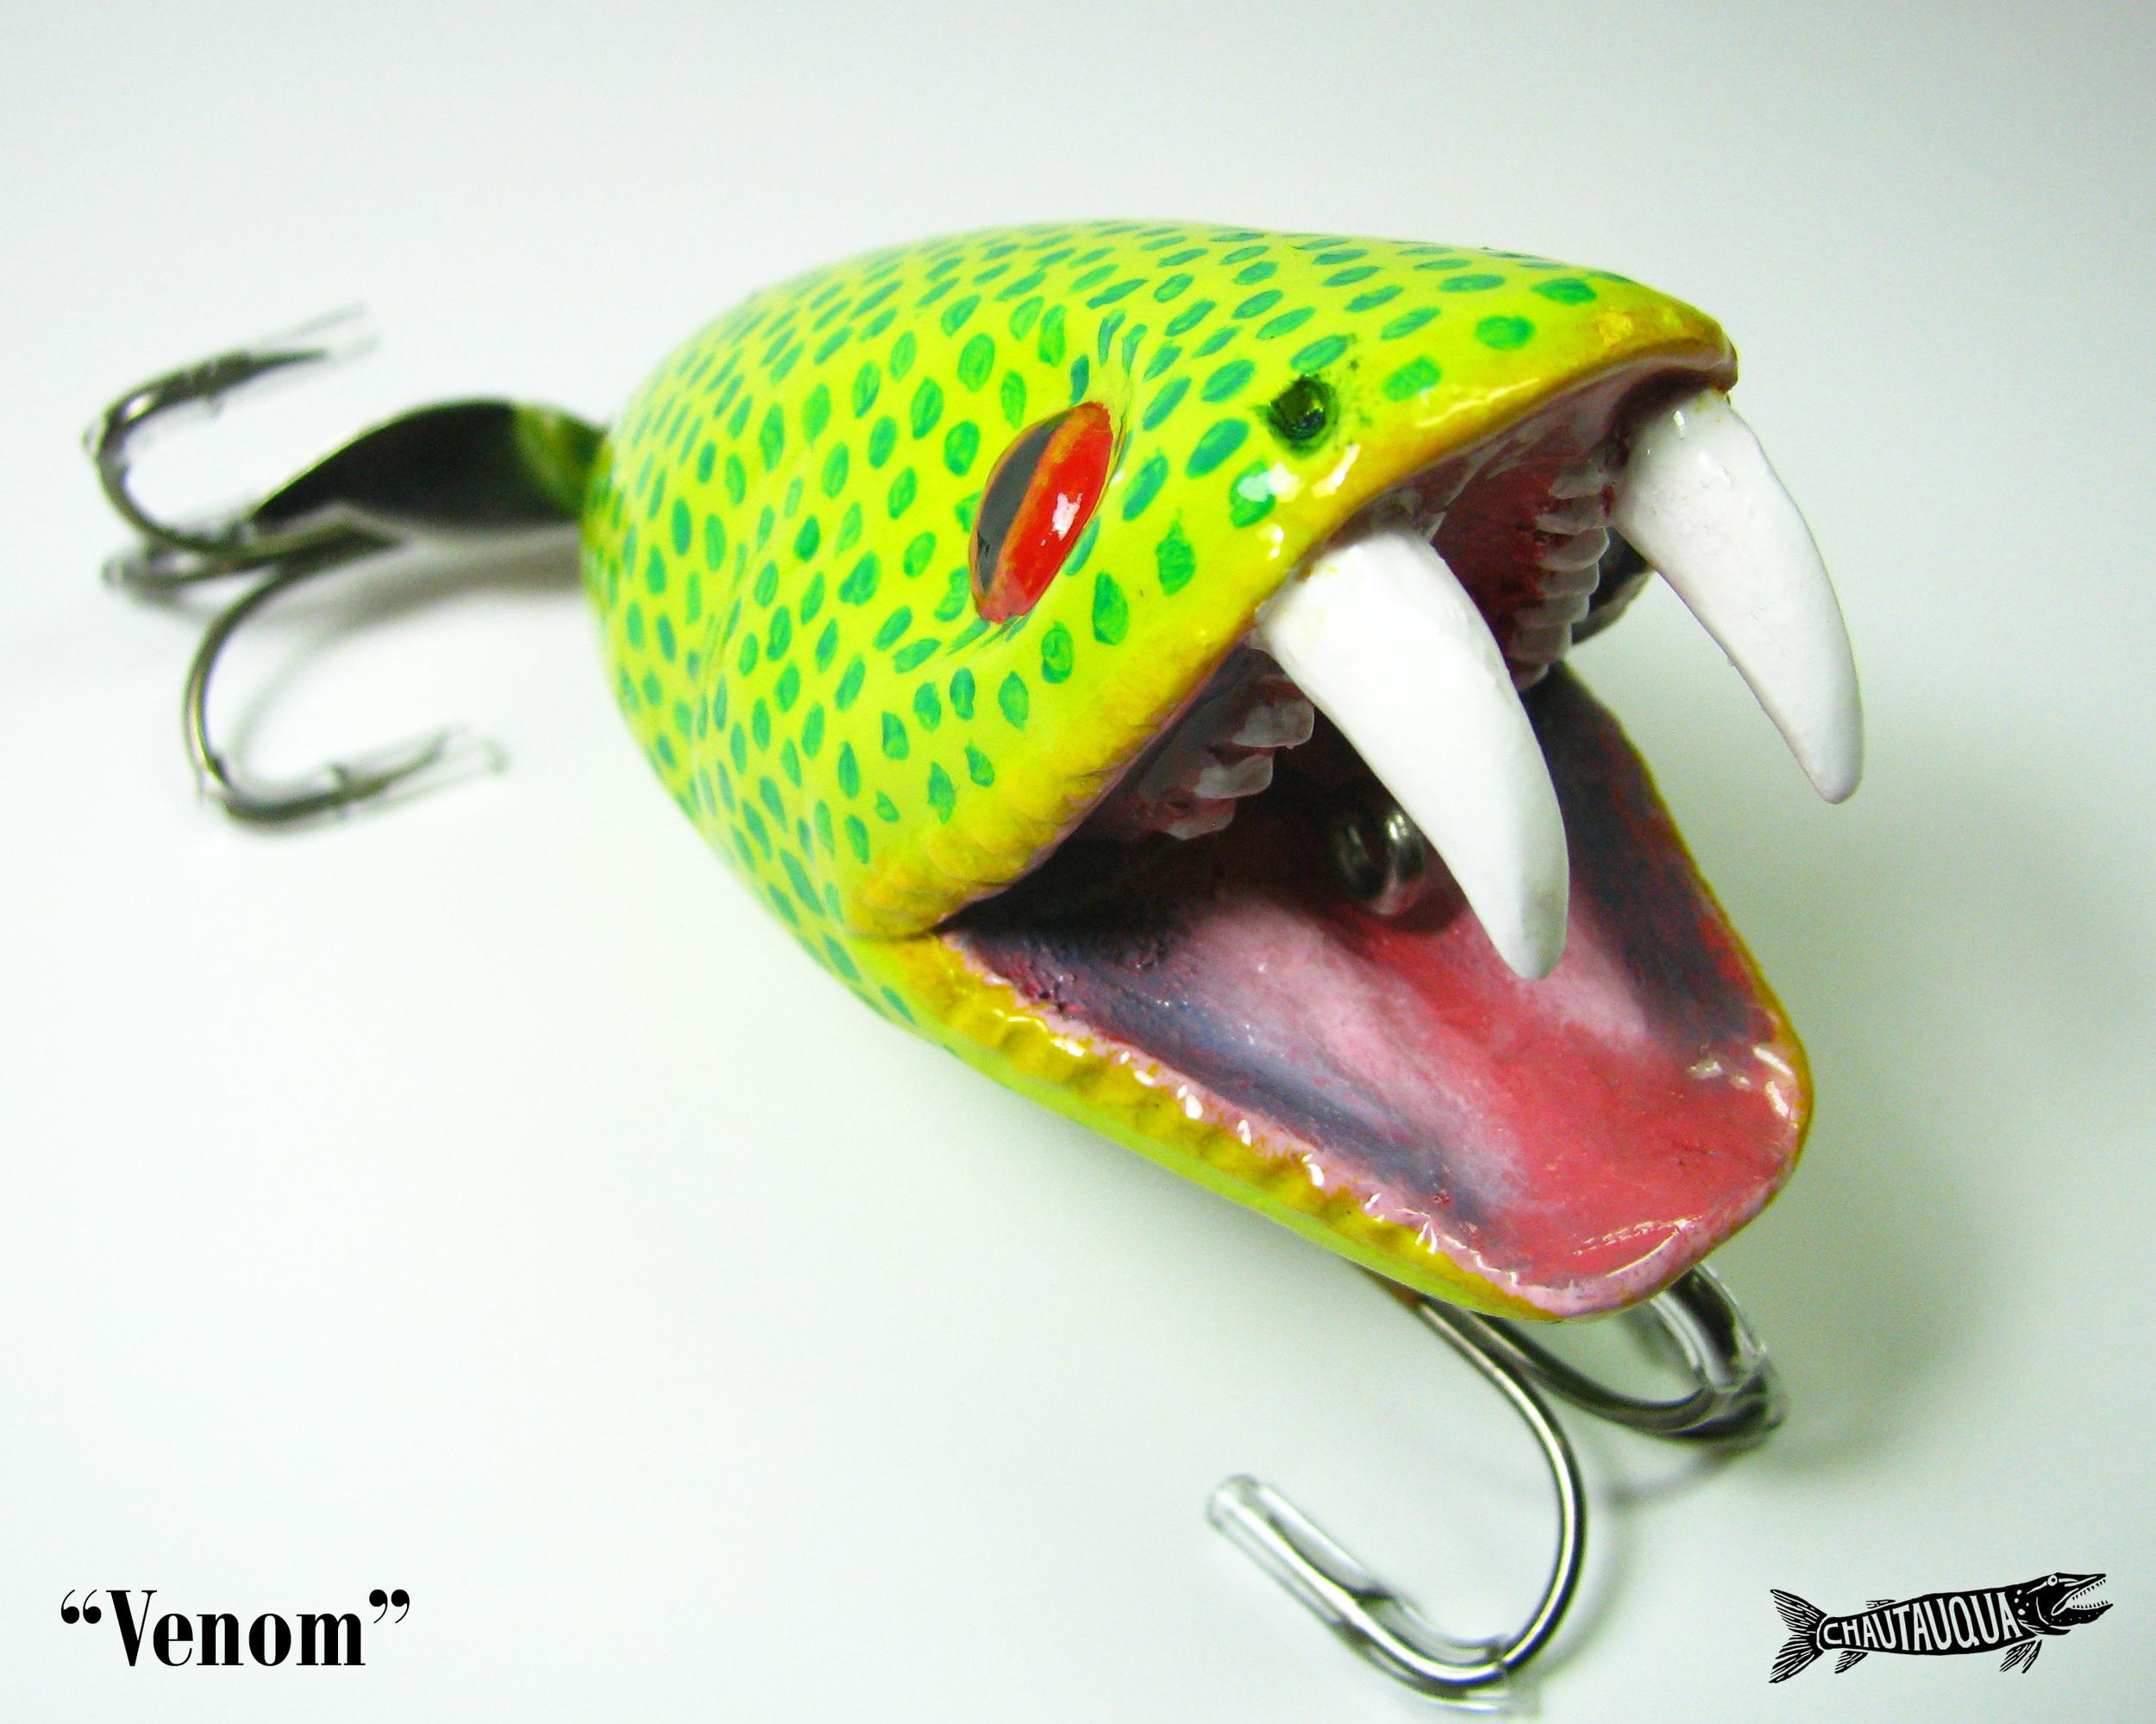 Venom1.jpg